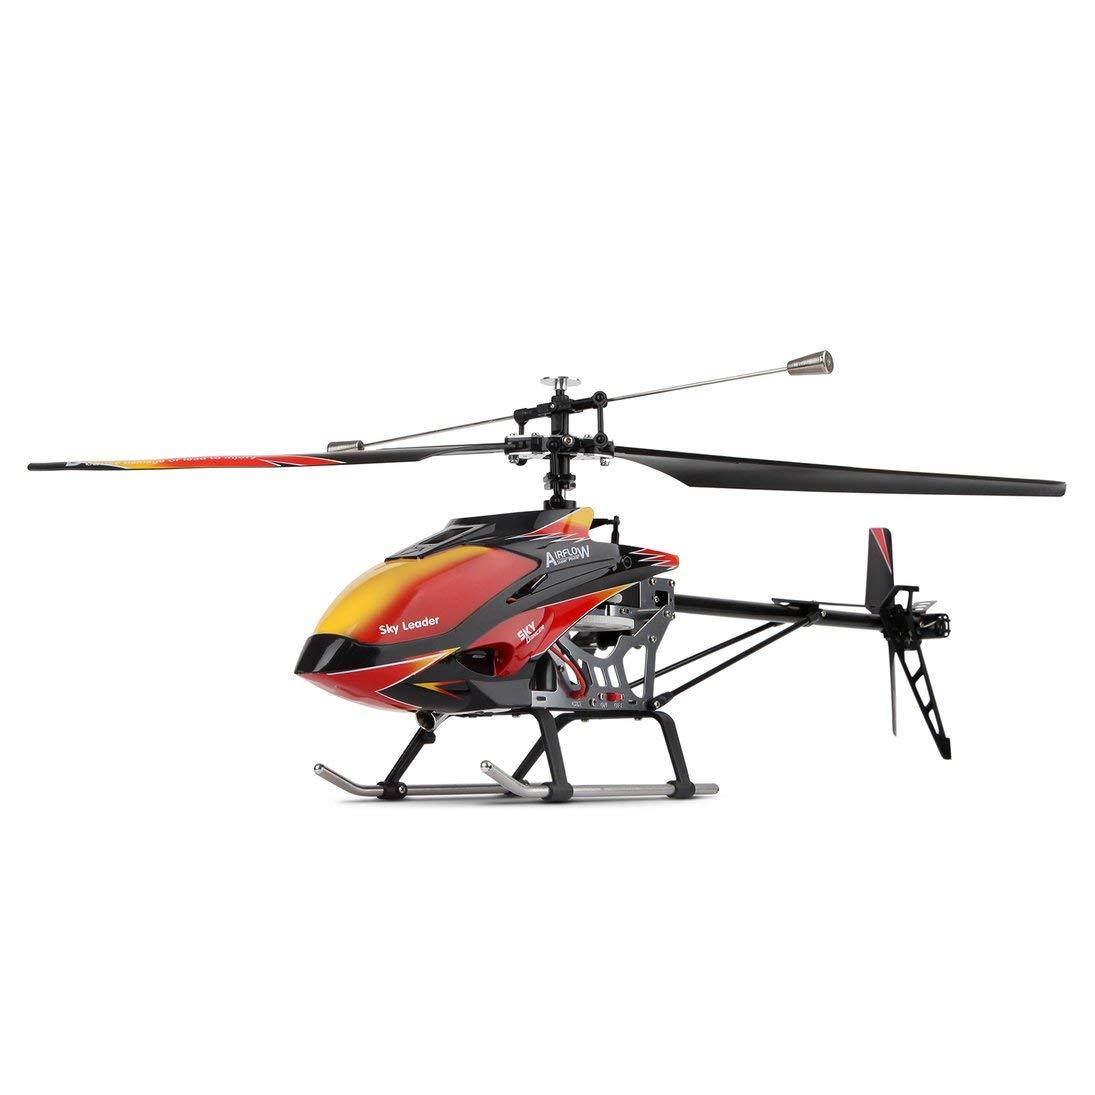 ToGames-DE Wltoys V913 Brushless 2.4G 4CH Single Blade Eingebauter Gyro Super Stabile Flug Hohe Effizienz Motor RC Hubschrauber